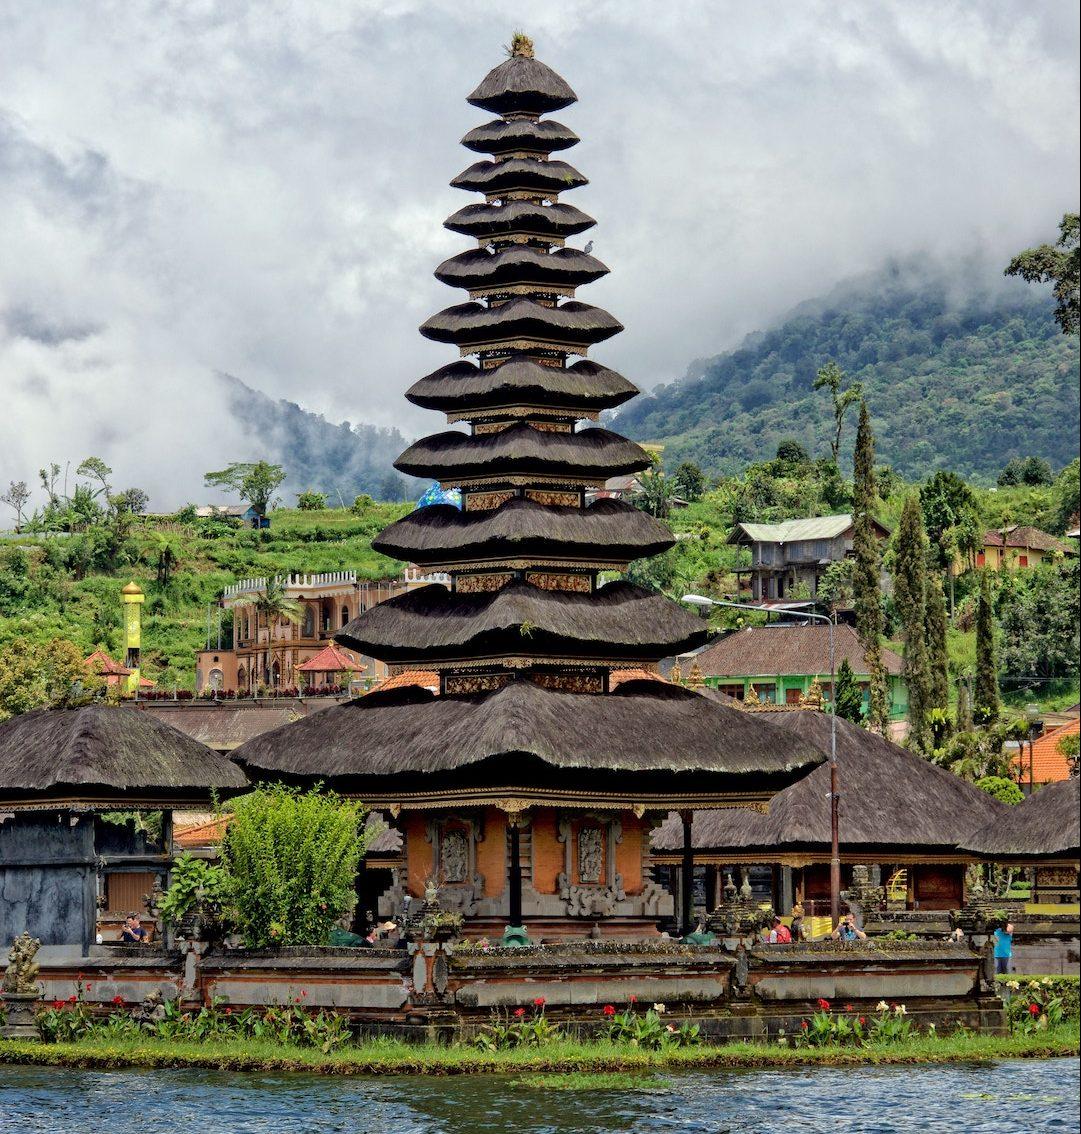 PhotoFly Travel Club   Bali Group Tours   PhotoFly Travel Club